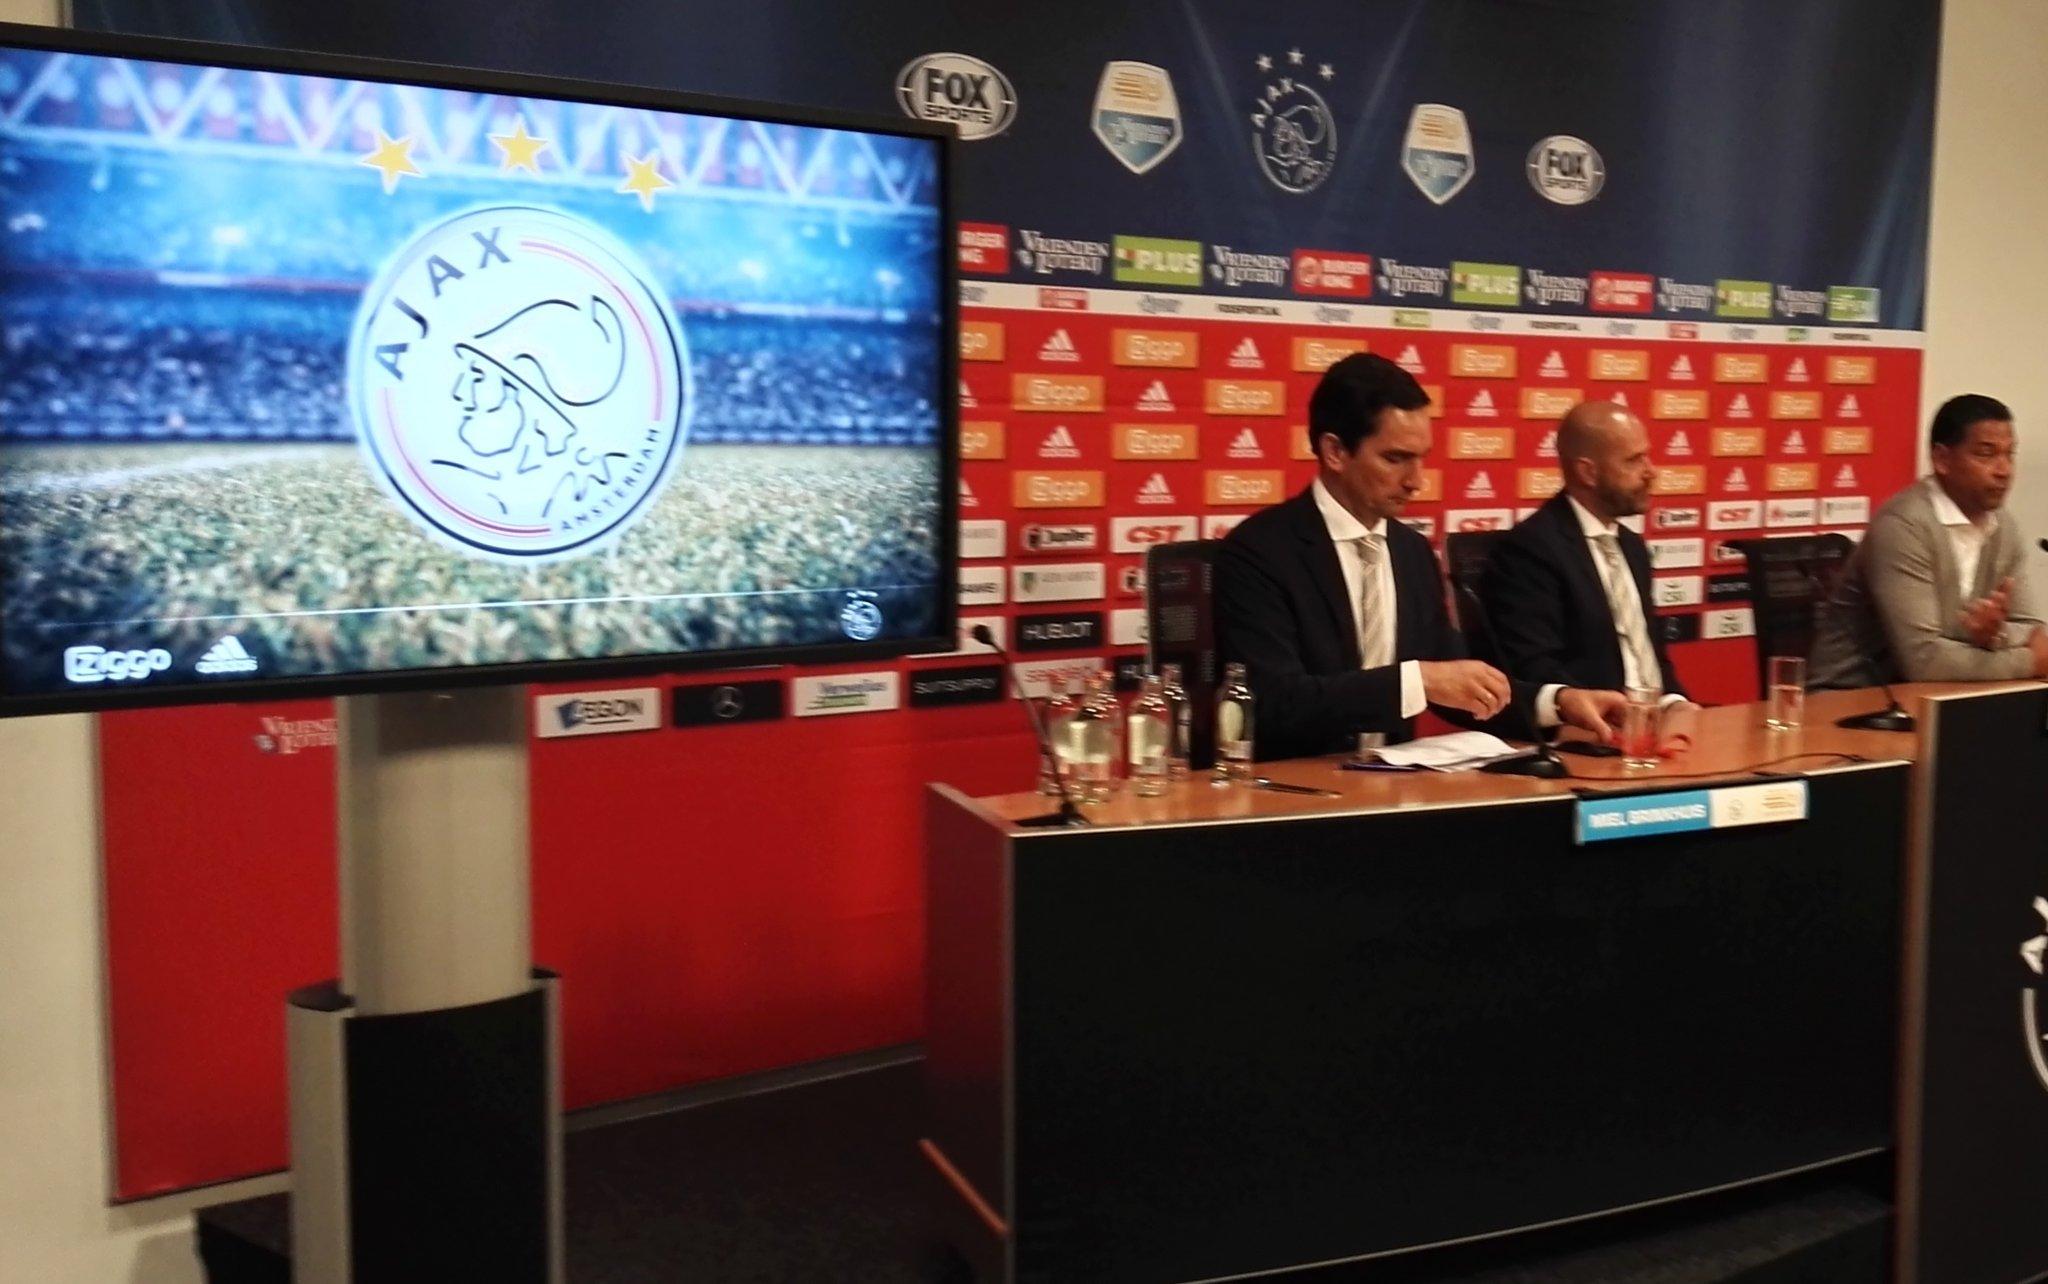 "AFC Ajax On Twitter: ""Persconferentie Is Begonnen. Bosz"